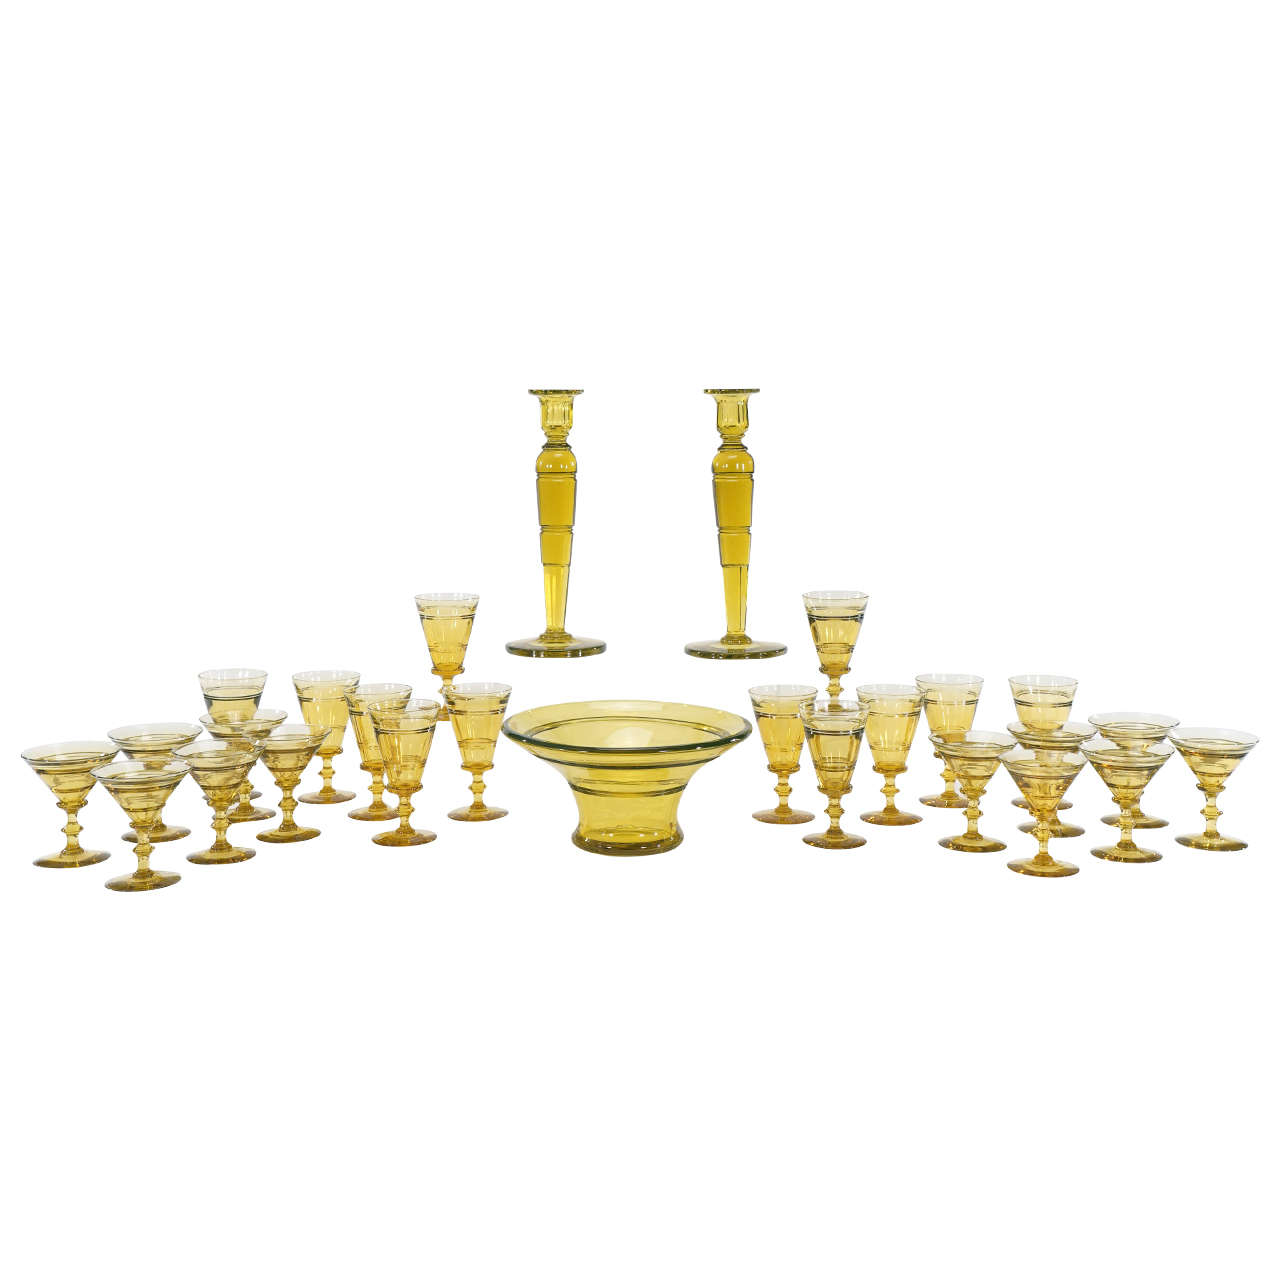 Steuben Art Deco Topaz Handblown Crystal, 72-Piece Table Service for 12